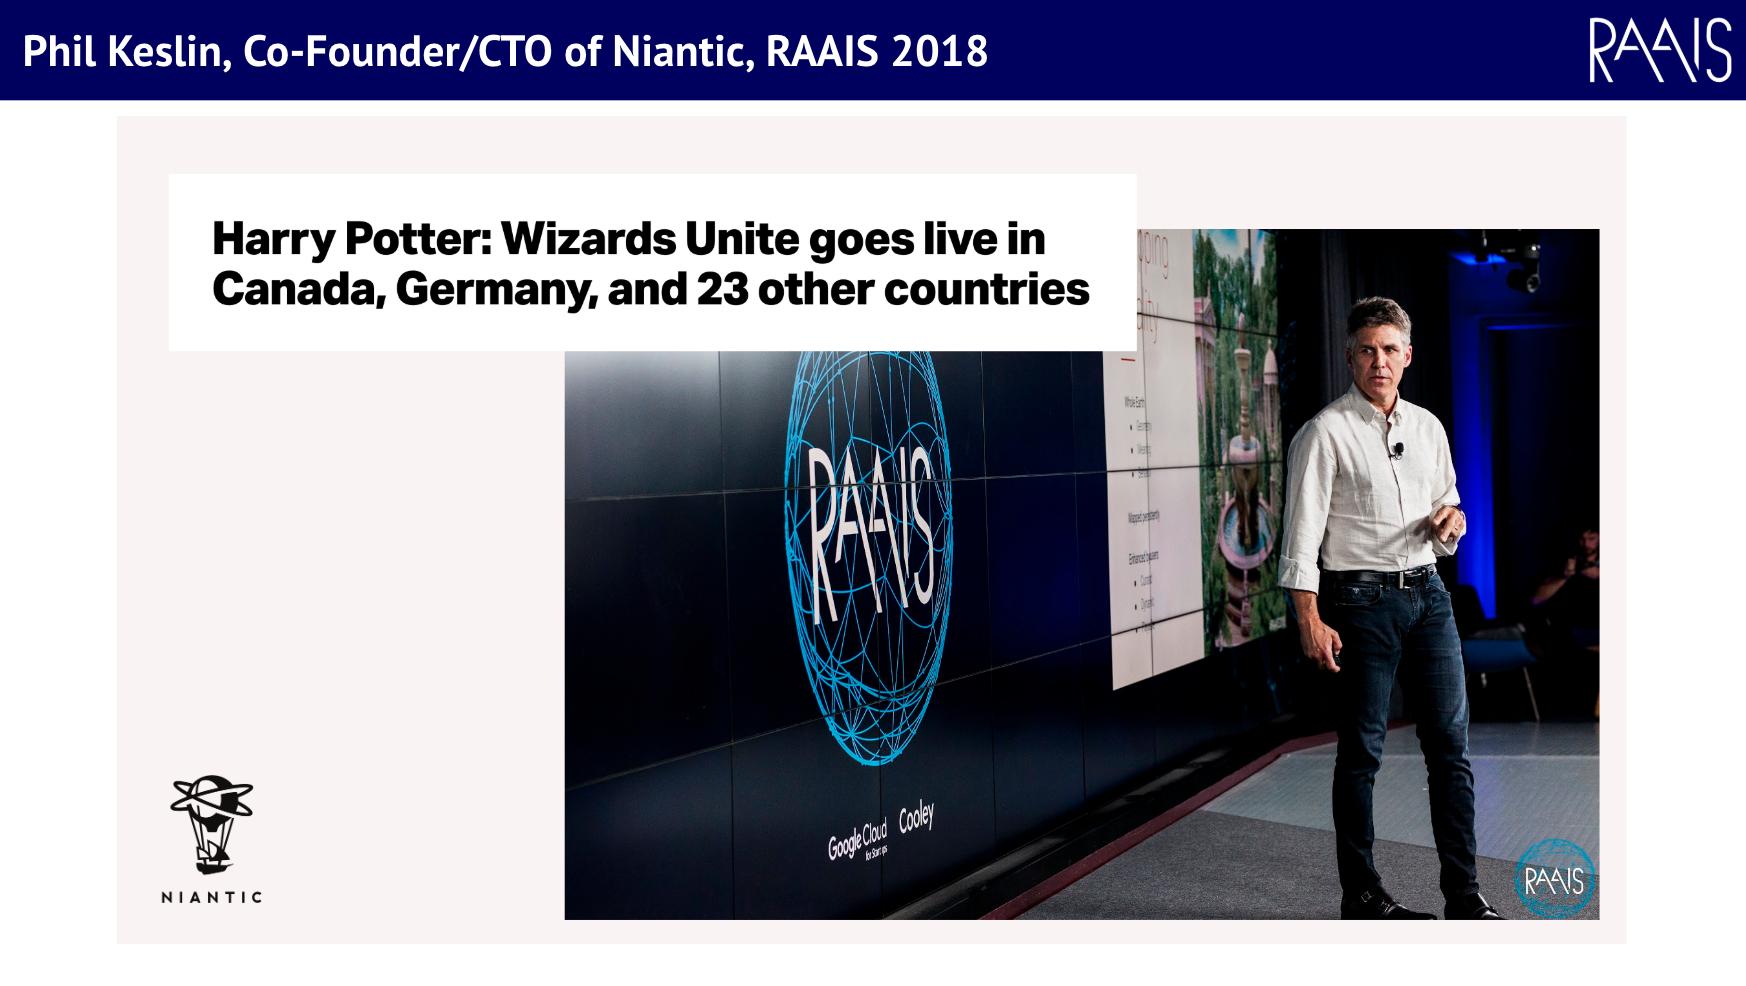 Phil Keslin, Niantic, RAAIS 2018